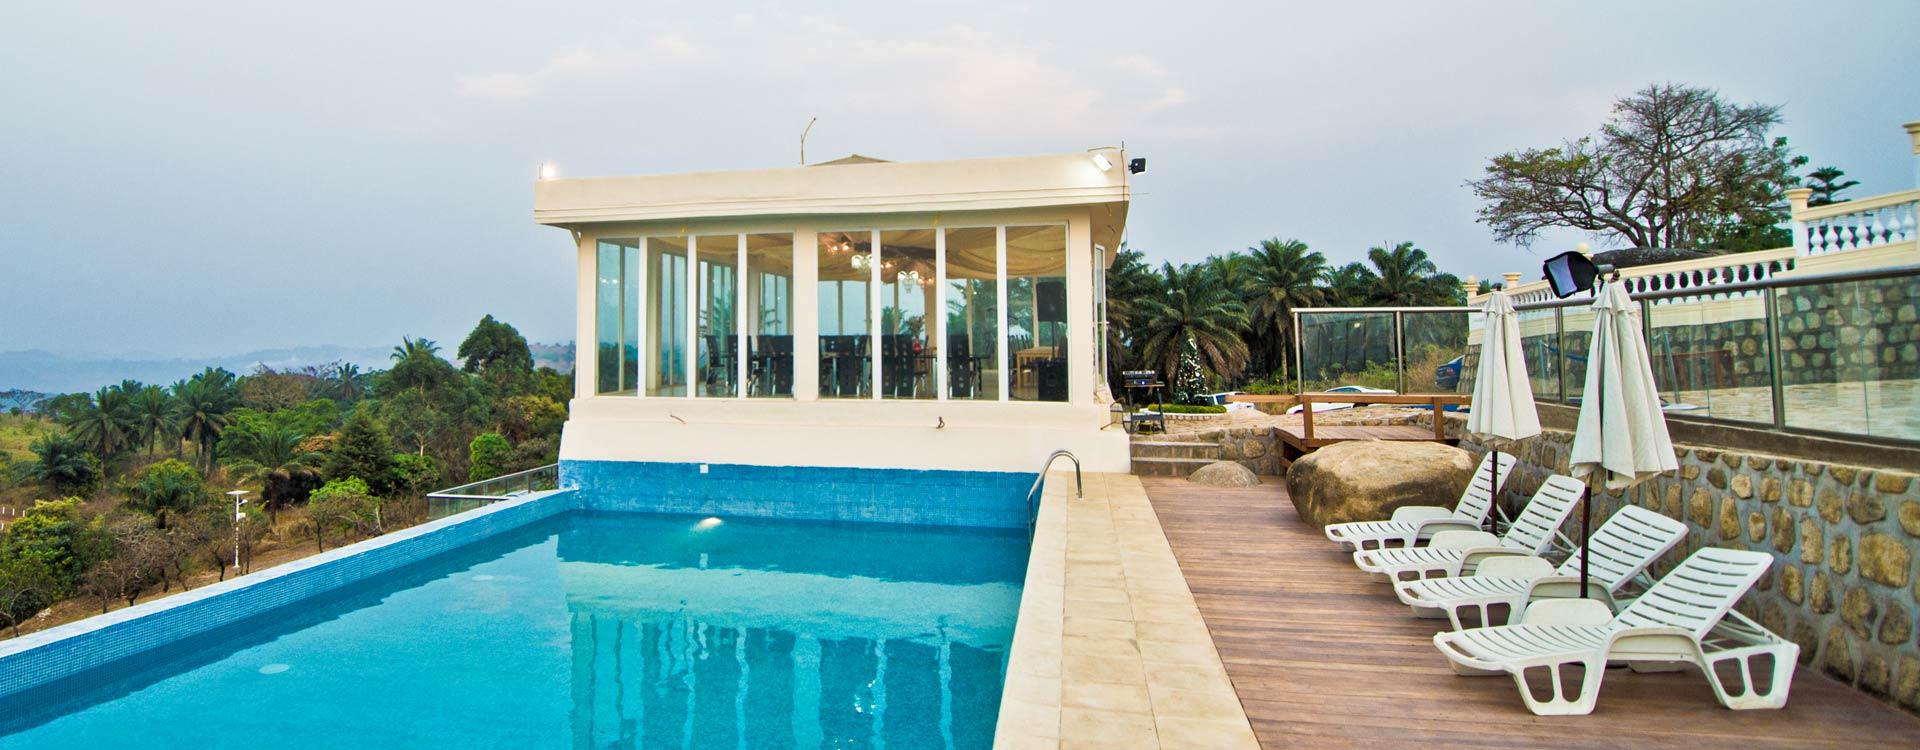 Saddle Hill Ranch & Resort in Bamenda Cameroon - Infinity Pool